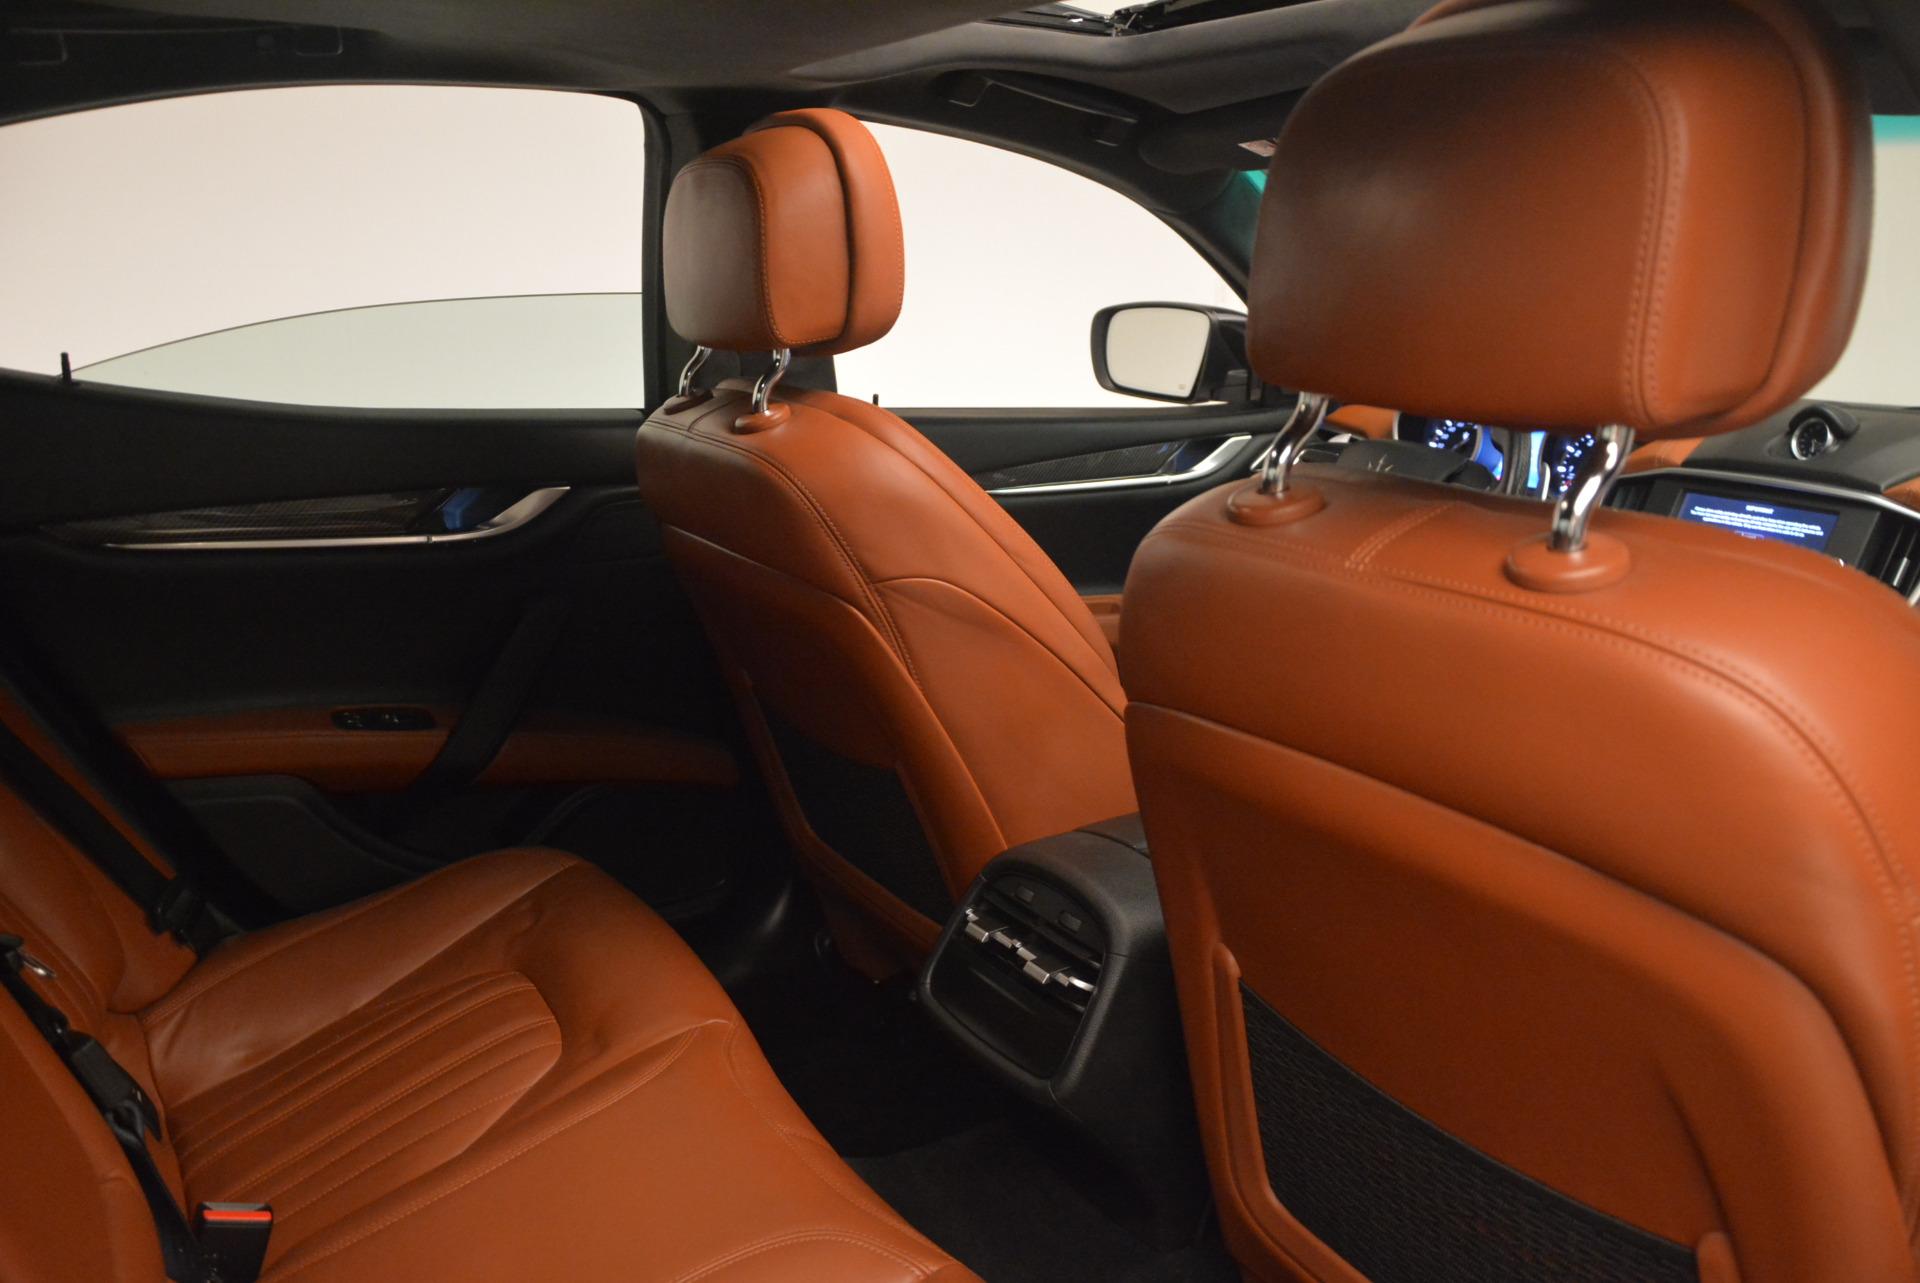 Used 2014 Maserati Ghibli S Q4 For Sale In Westport, CT 805_p23